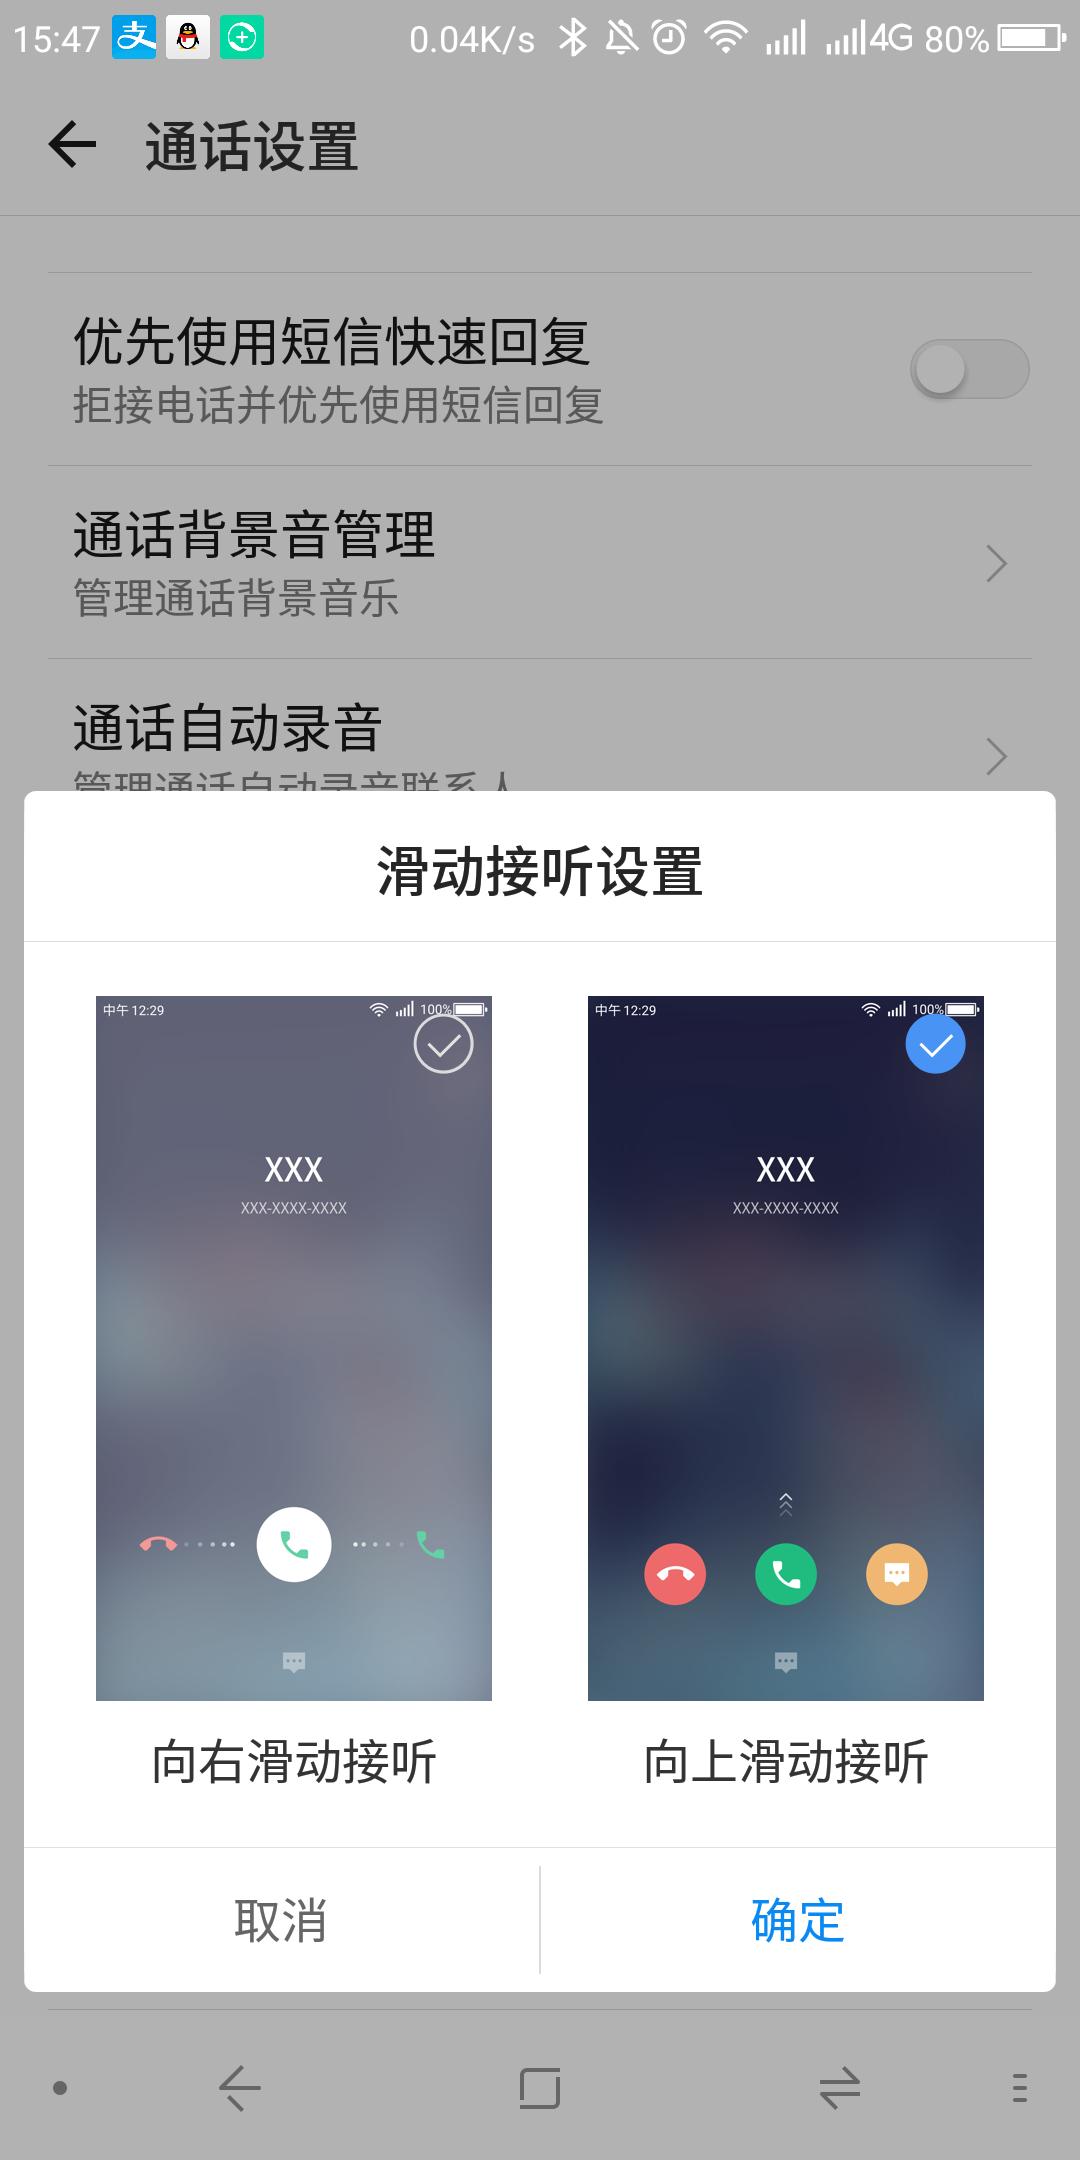 Screenshot_2018-07-02-15-47-19.png